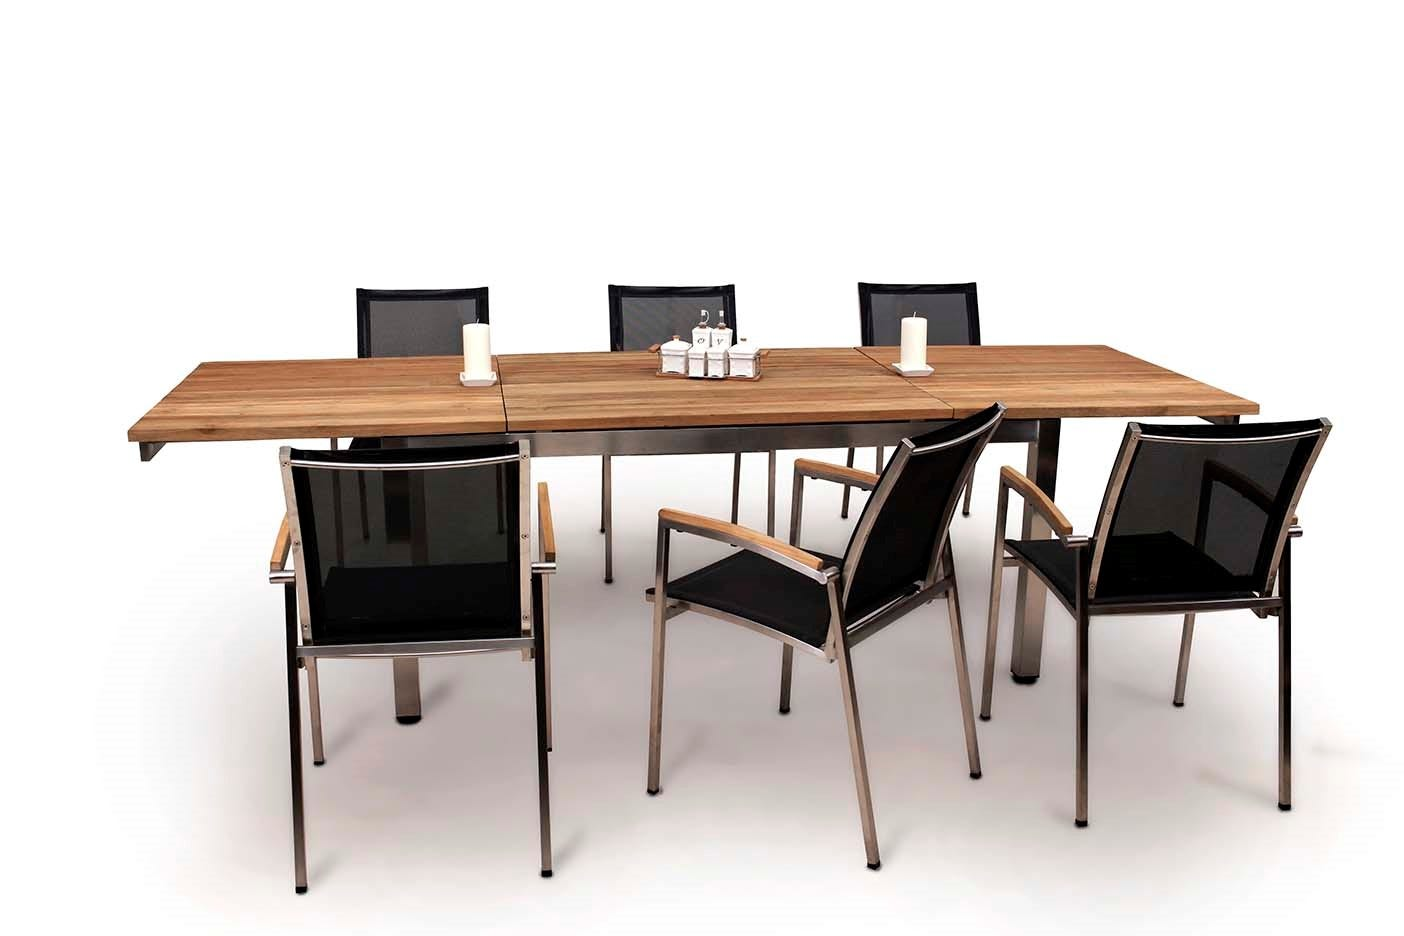 Uncategorized/black kitchen table sets/assembly information table option black kitchen table 4 chairs - Ext 1 7 2 8 X 9 6